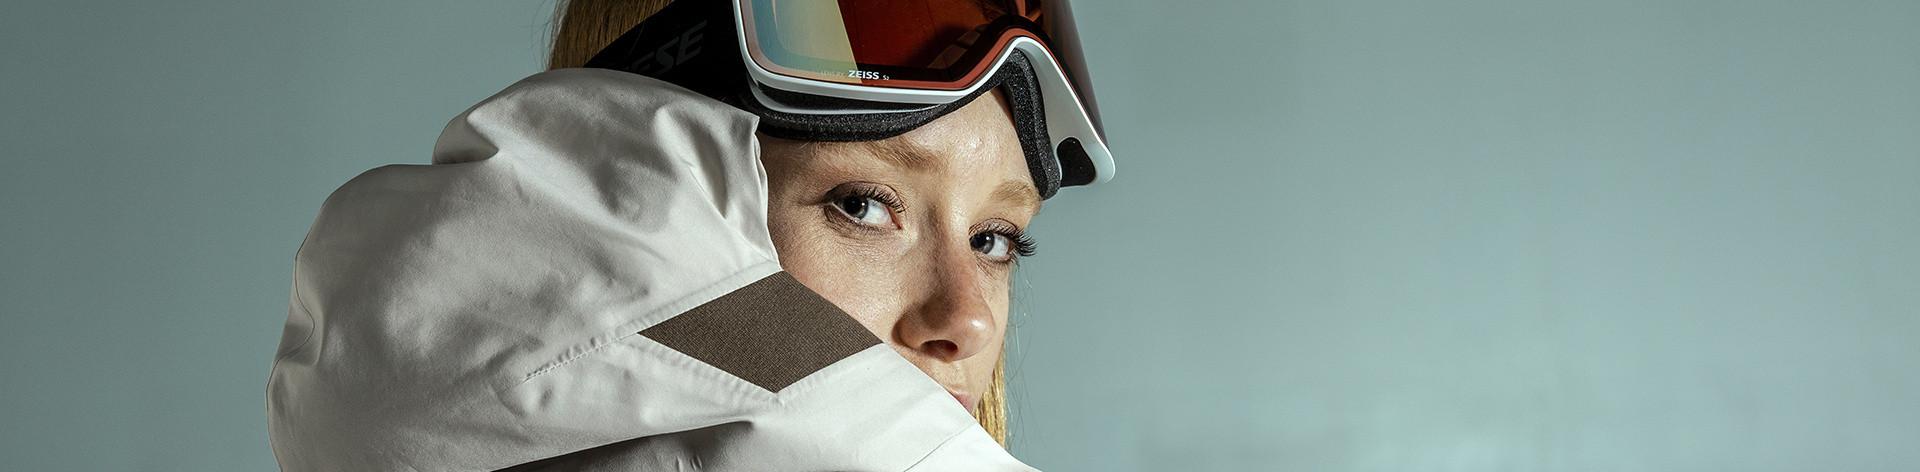 Dainese Winter Sports - Mountain Lifestyle